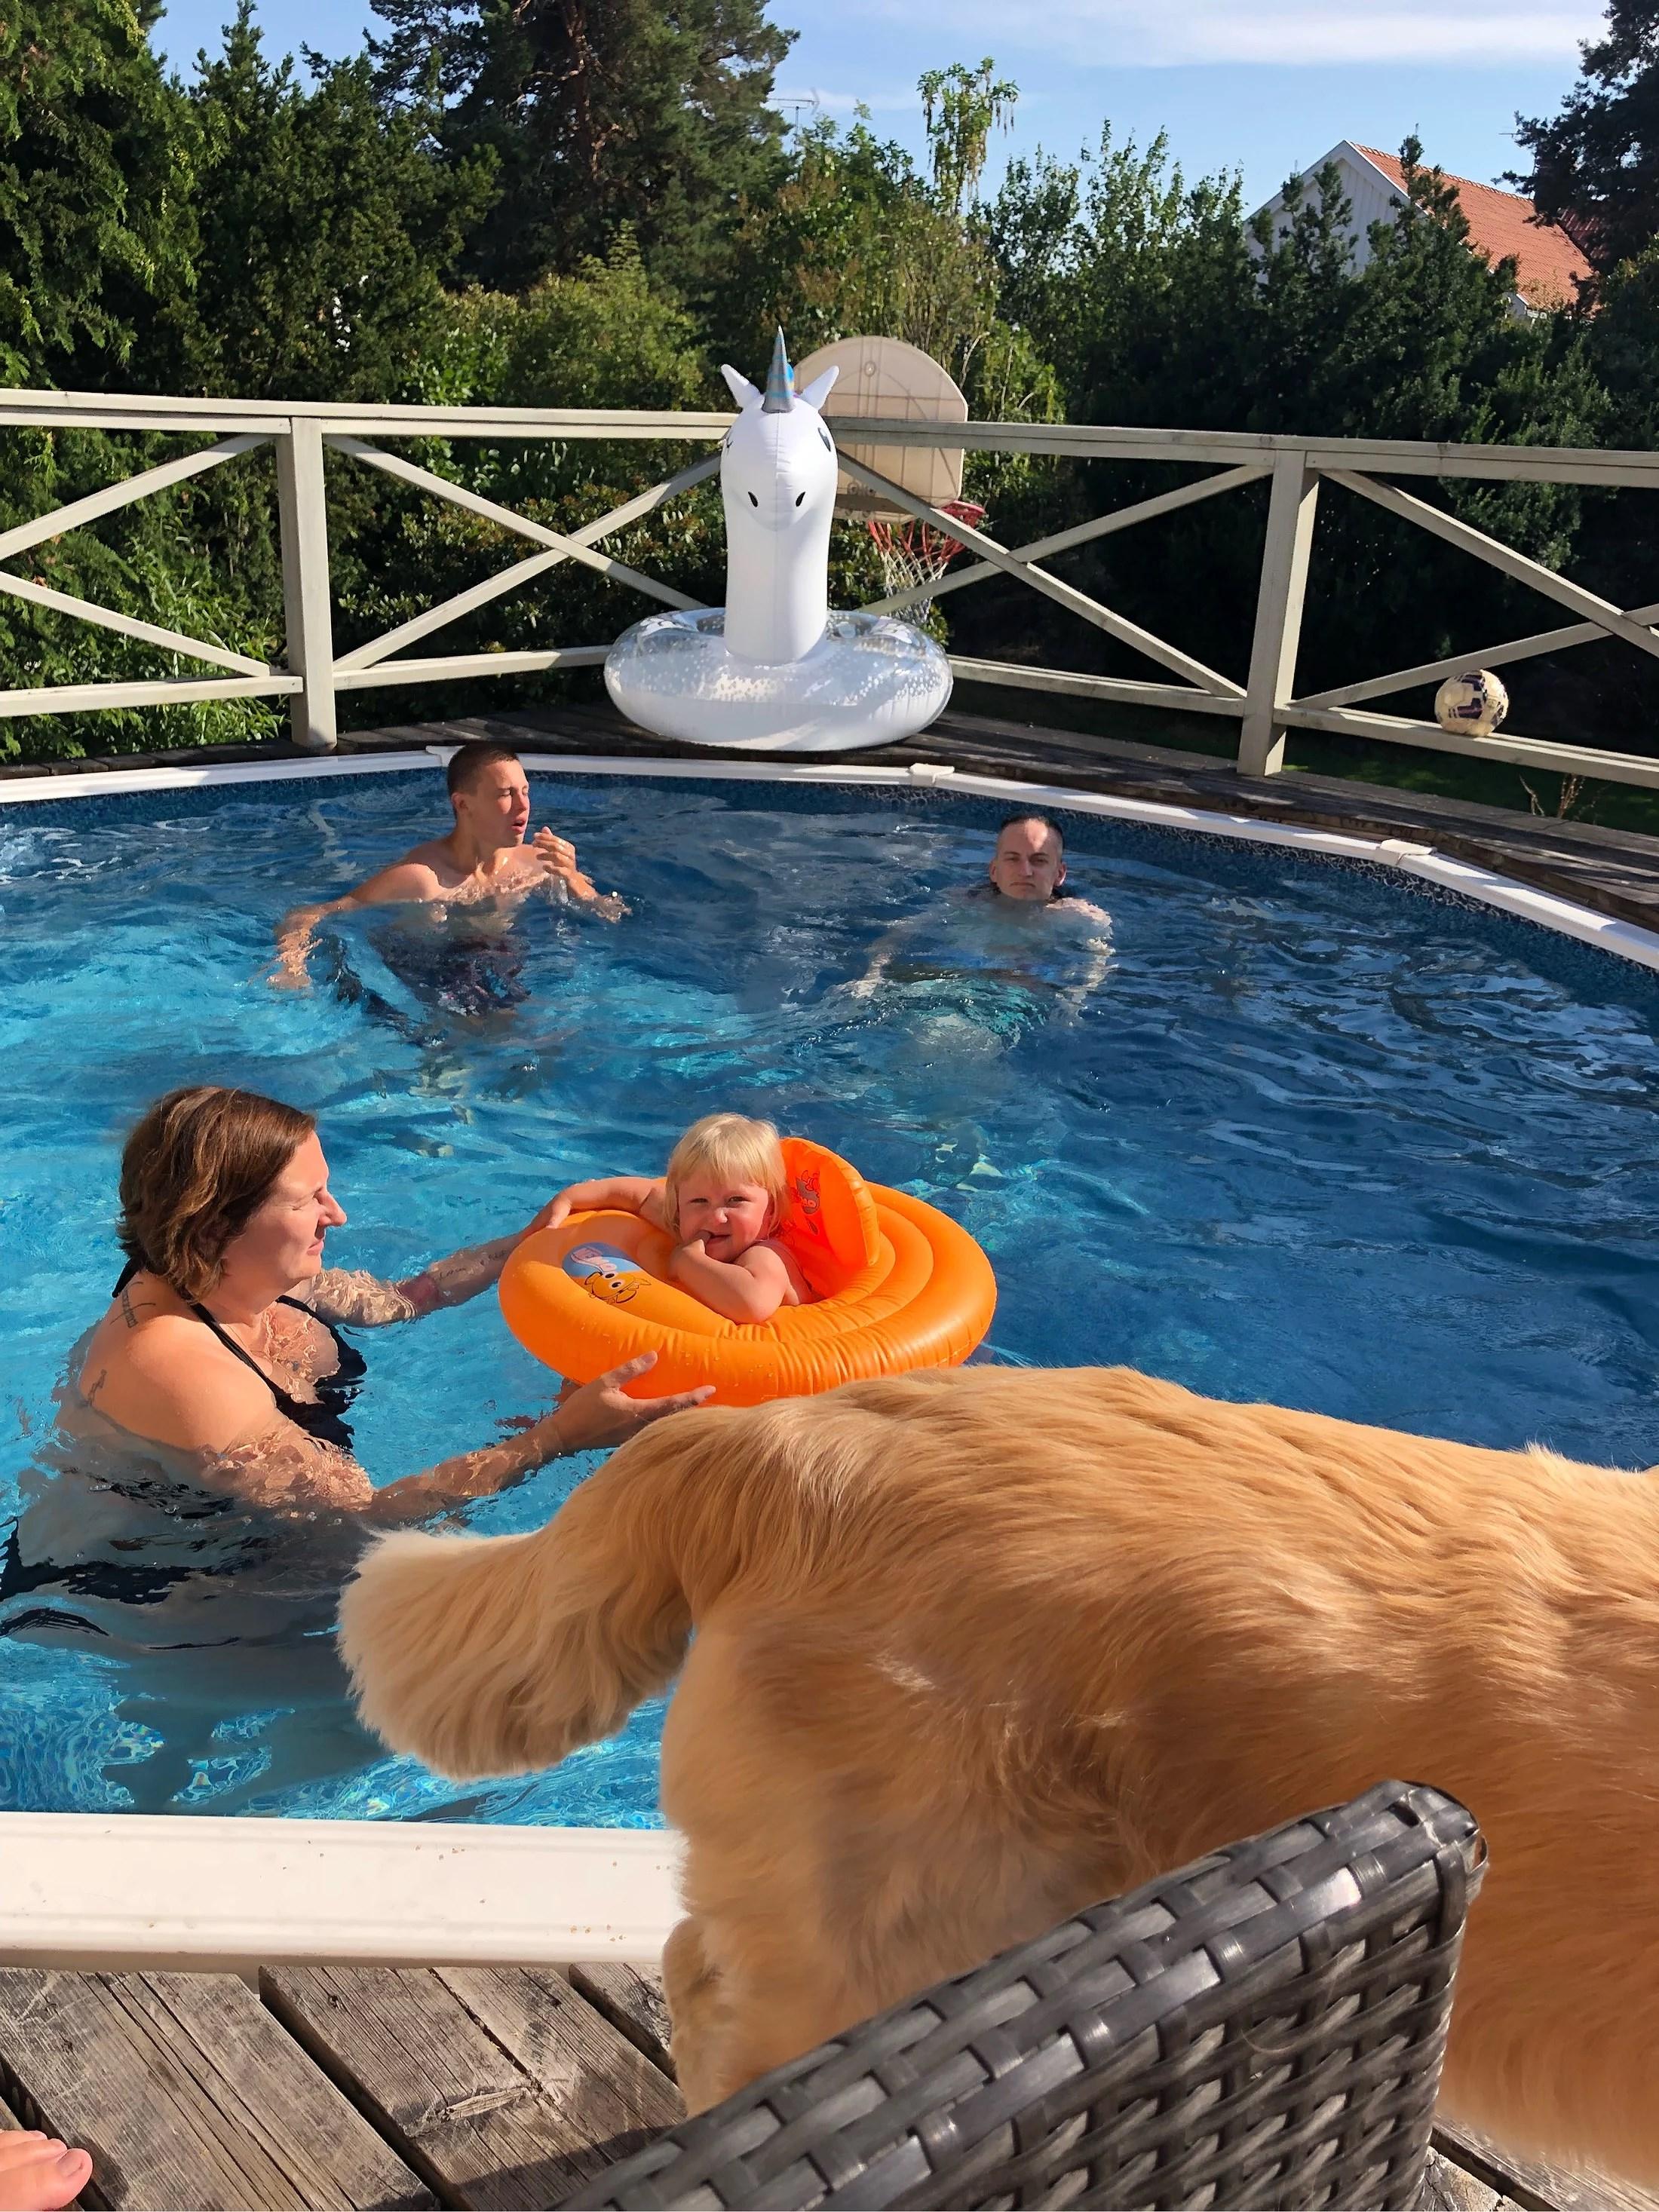 Bad i poolen